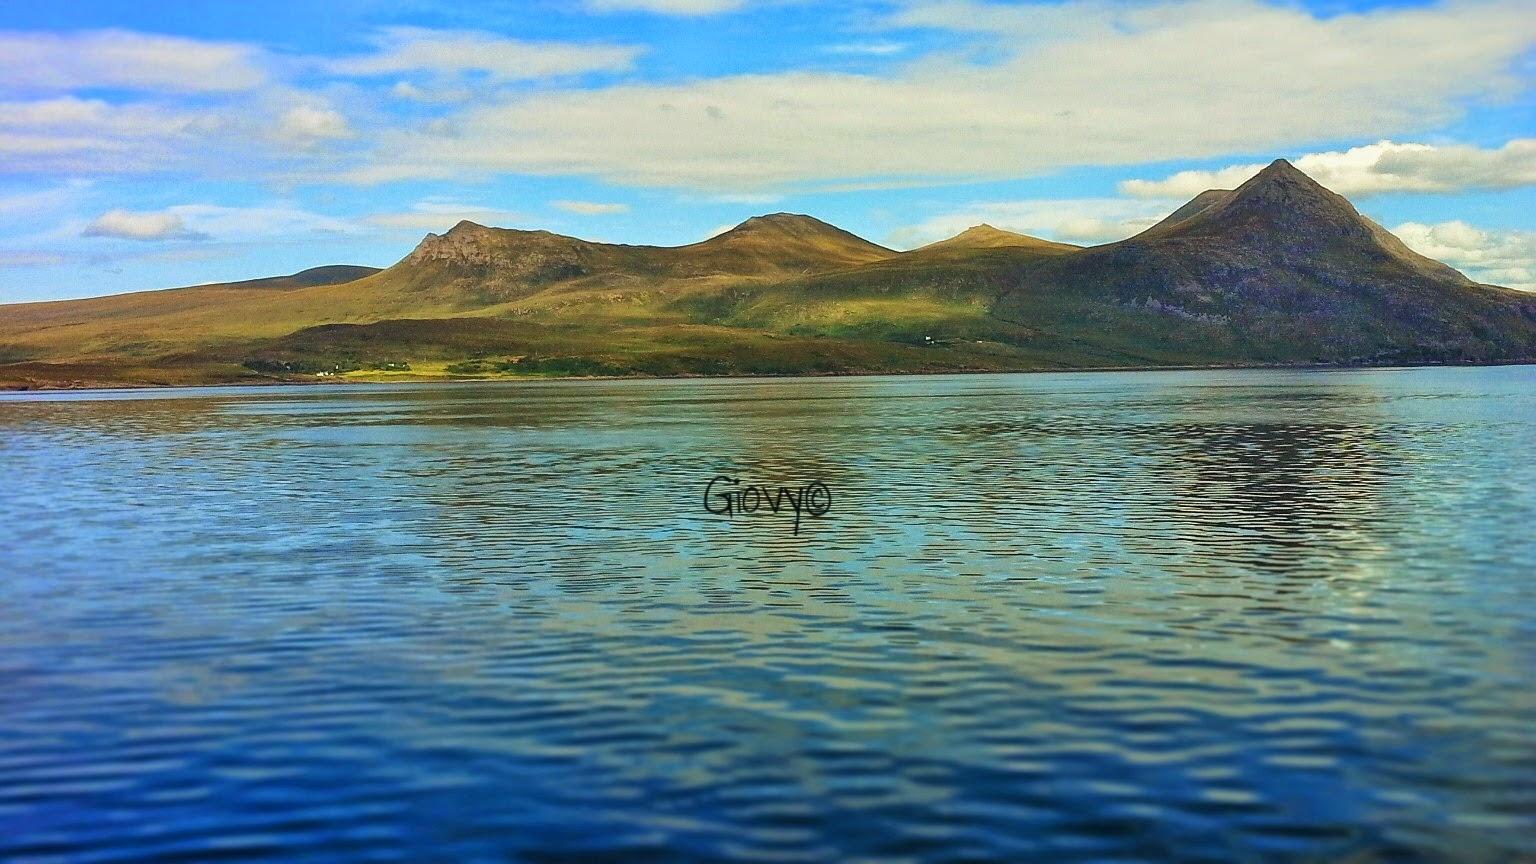 Visitare Ullapool in Scozia